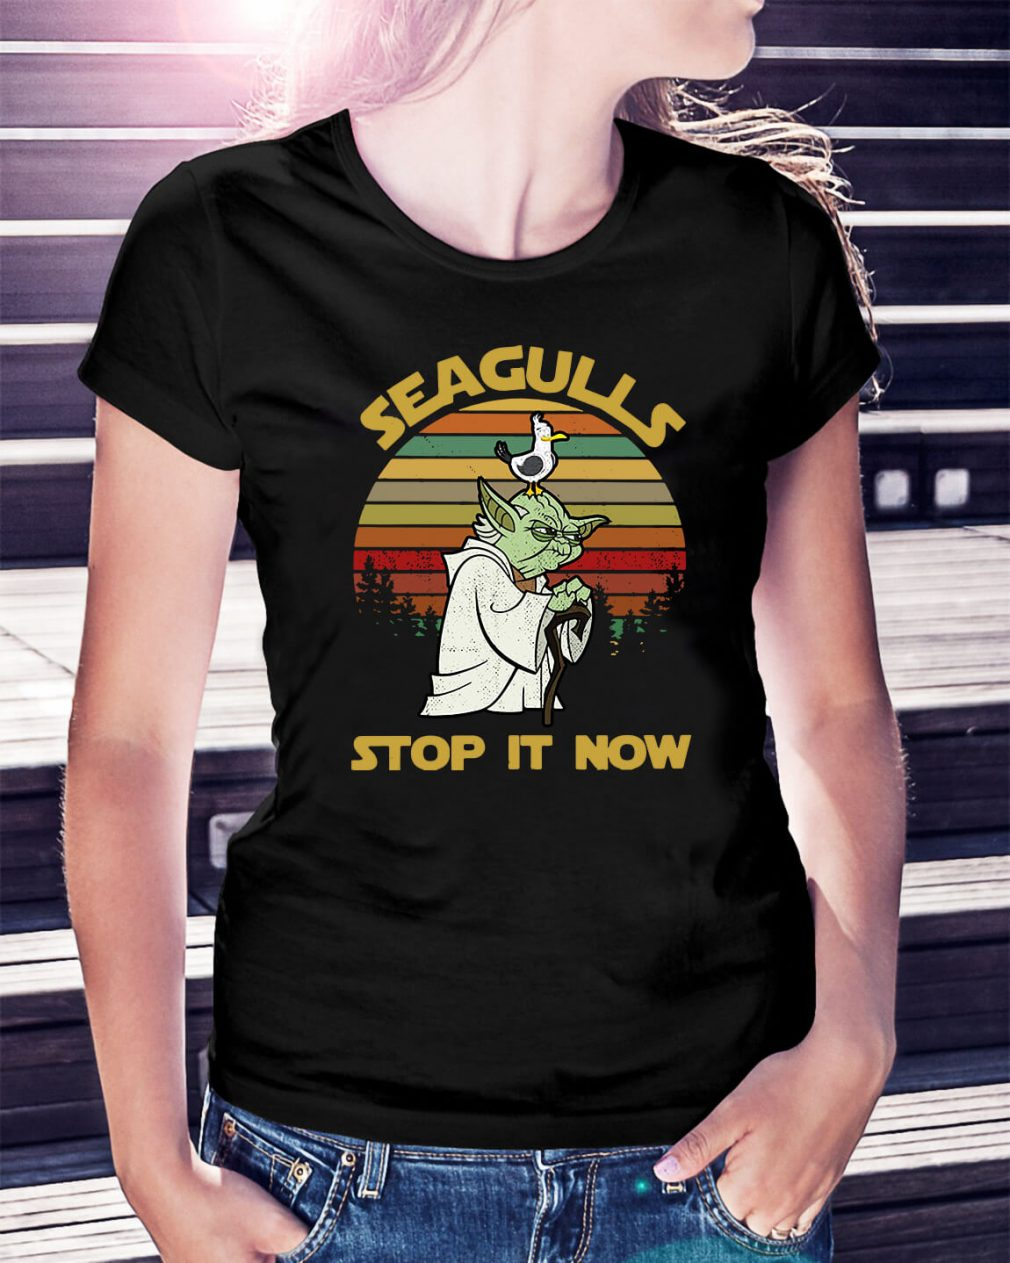 Sunset retro style Seagulls stop it now Ladies Tee